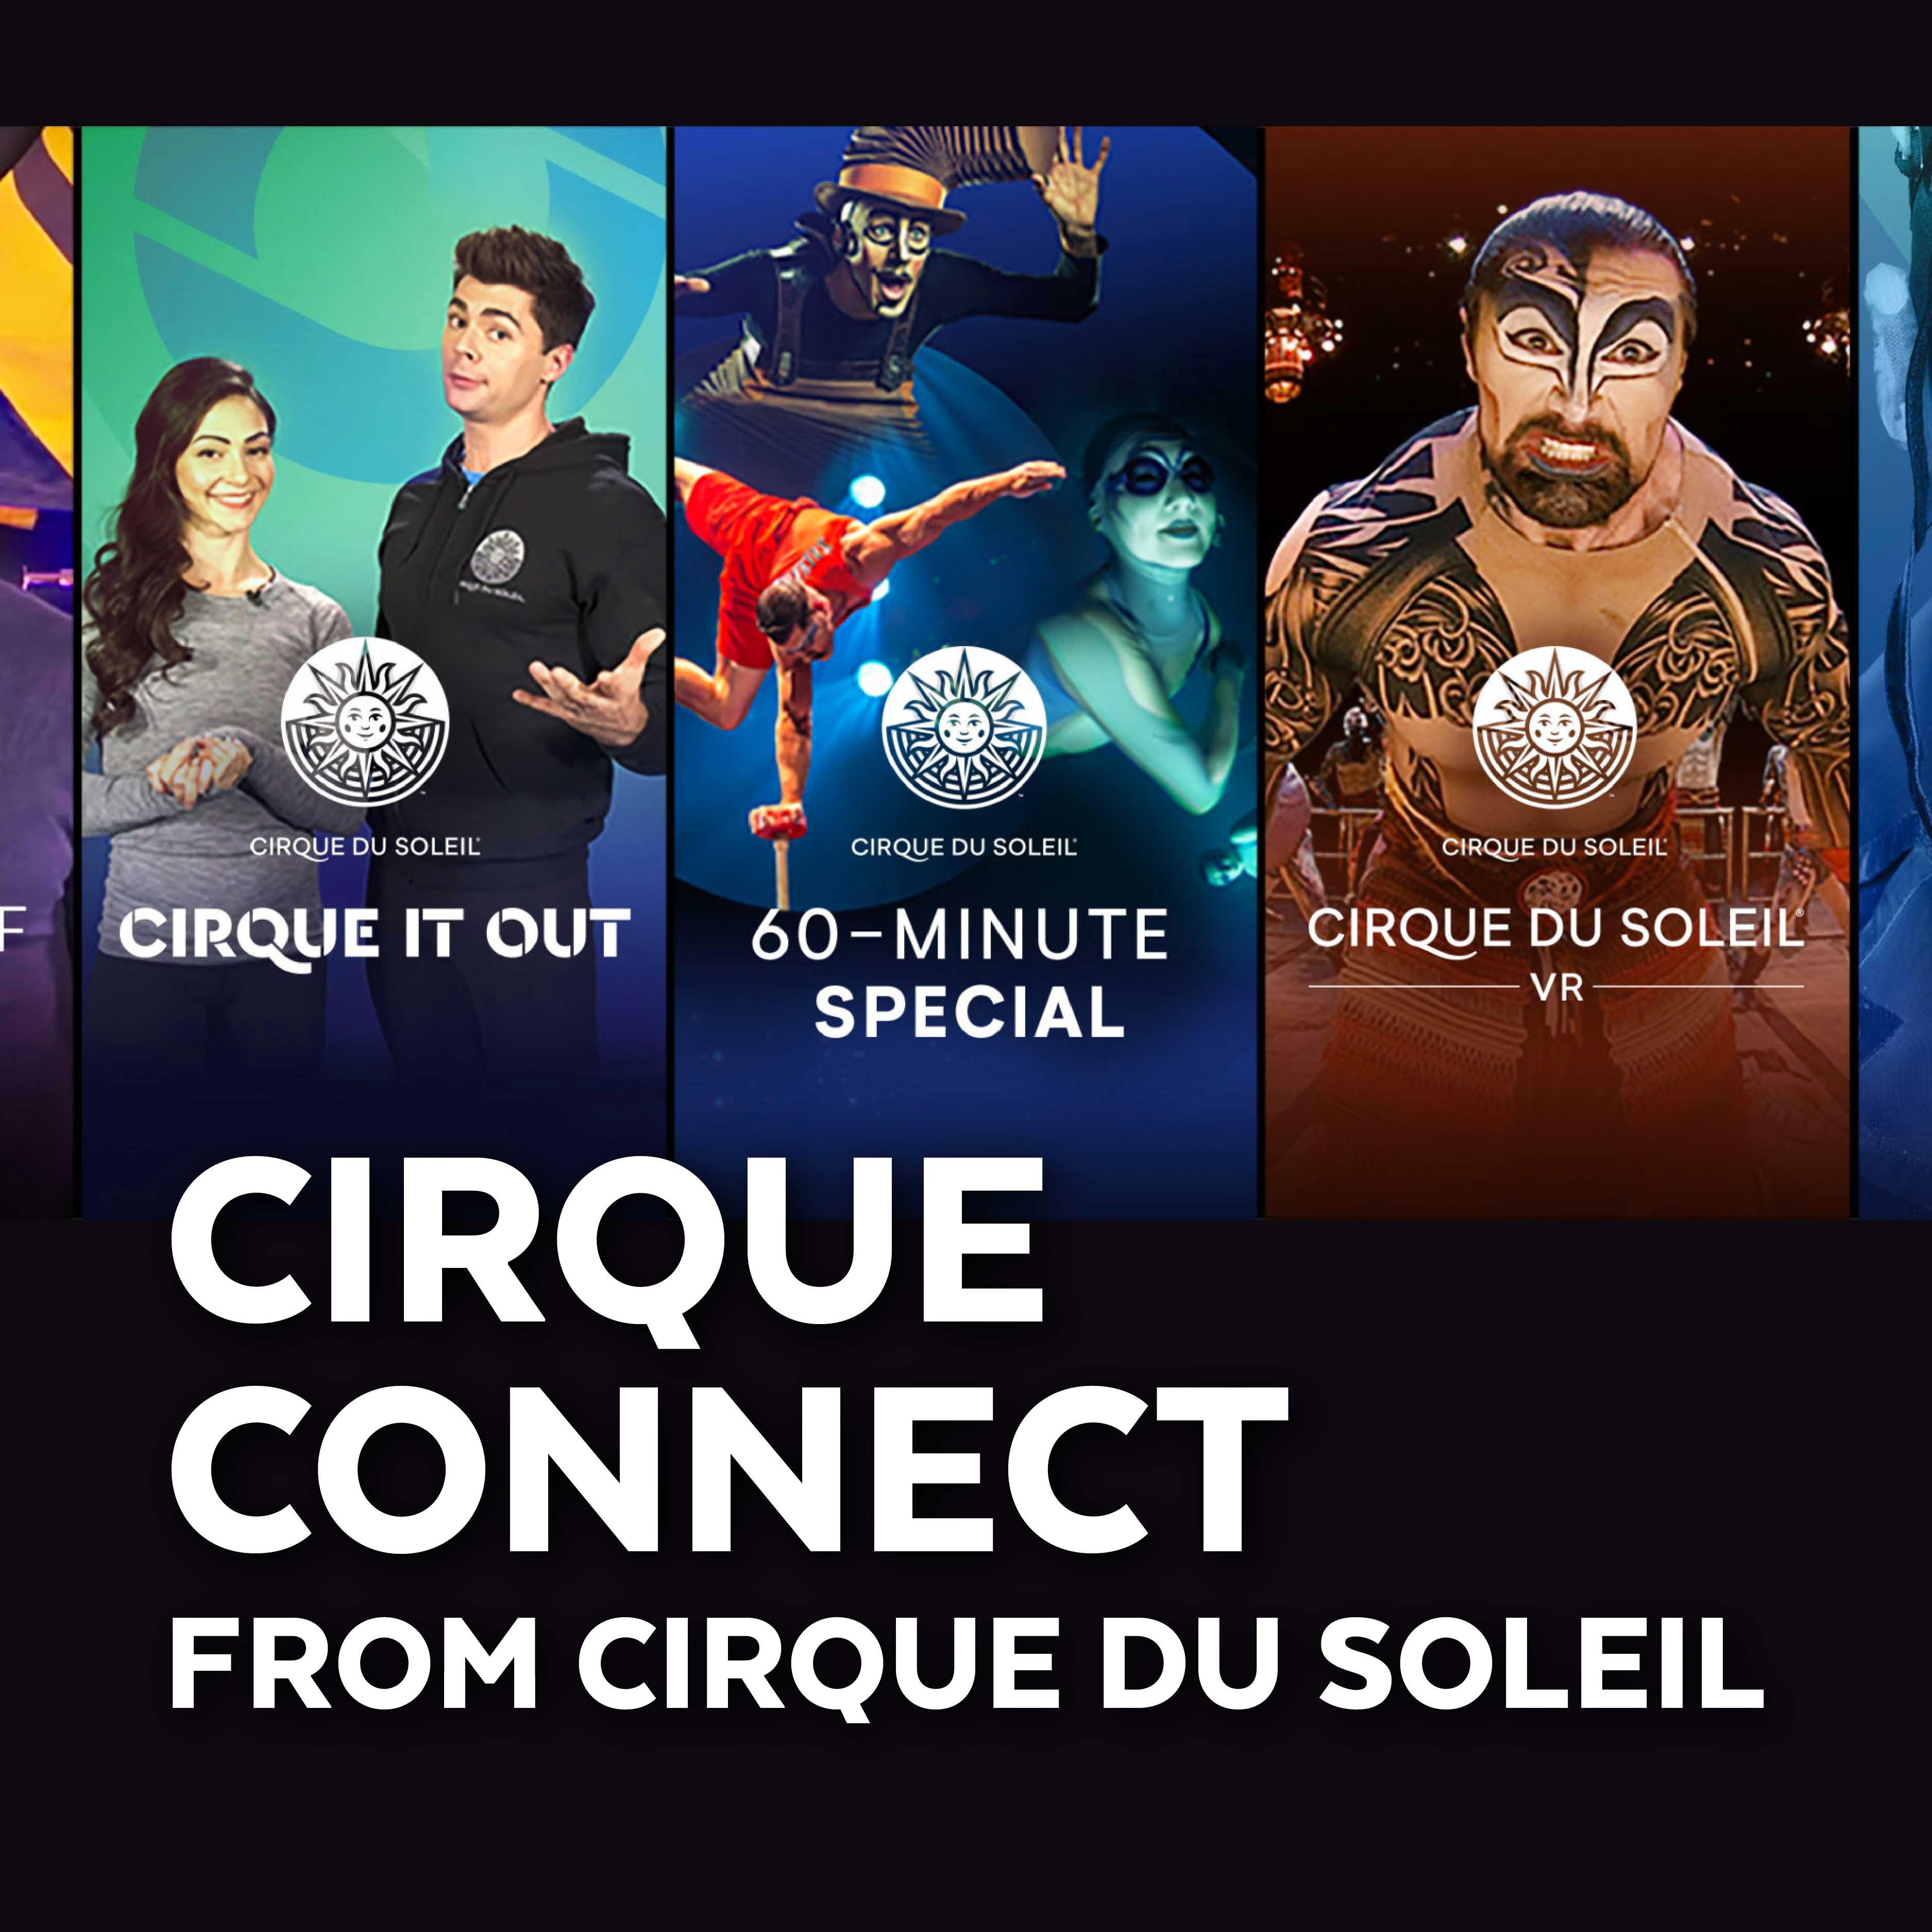 cirque-01.jpg